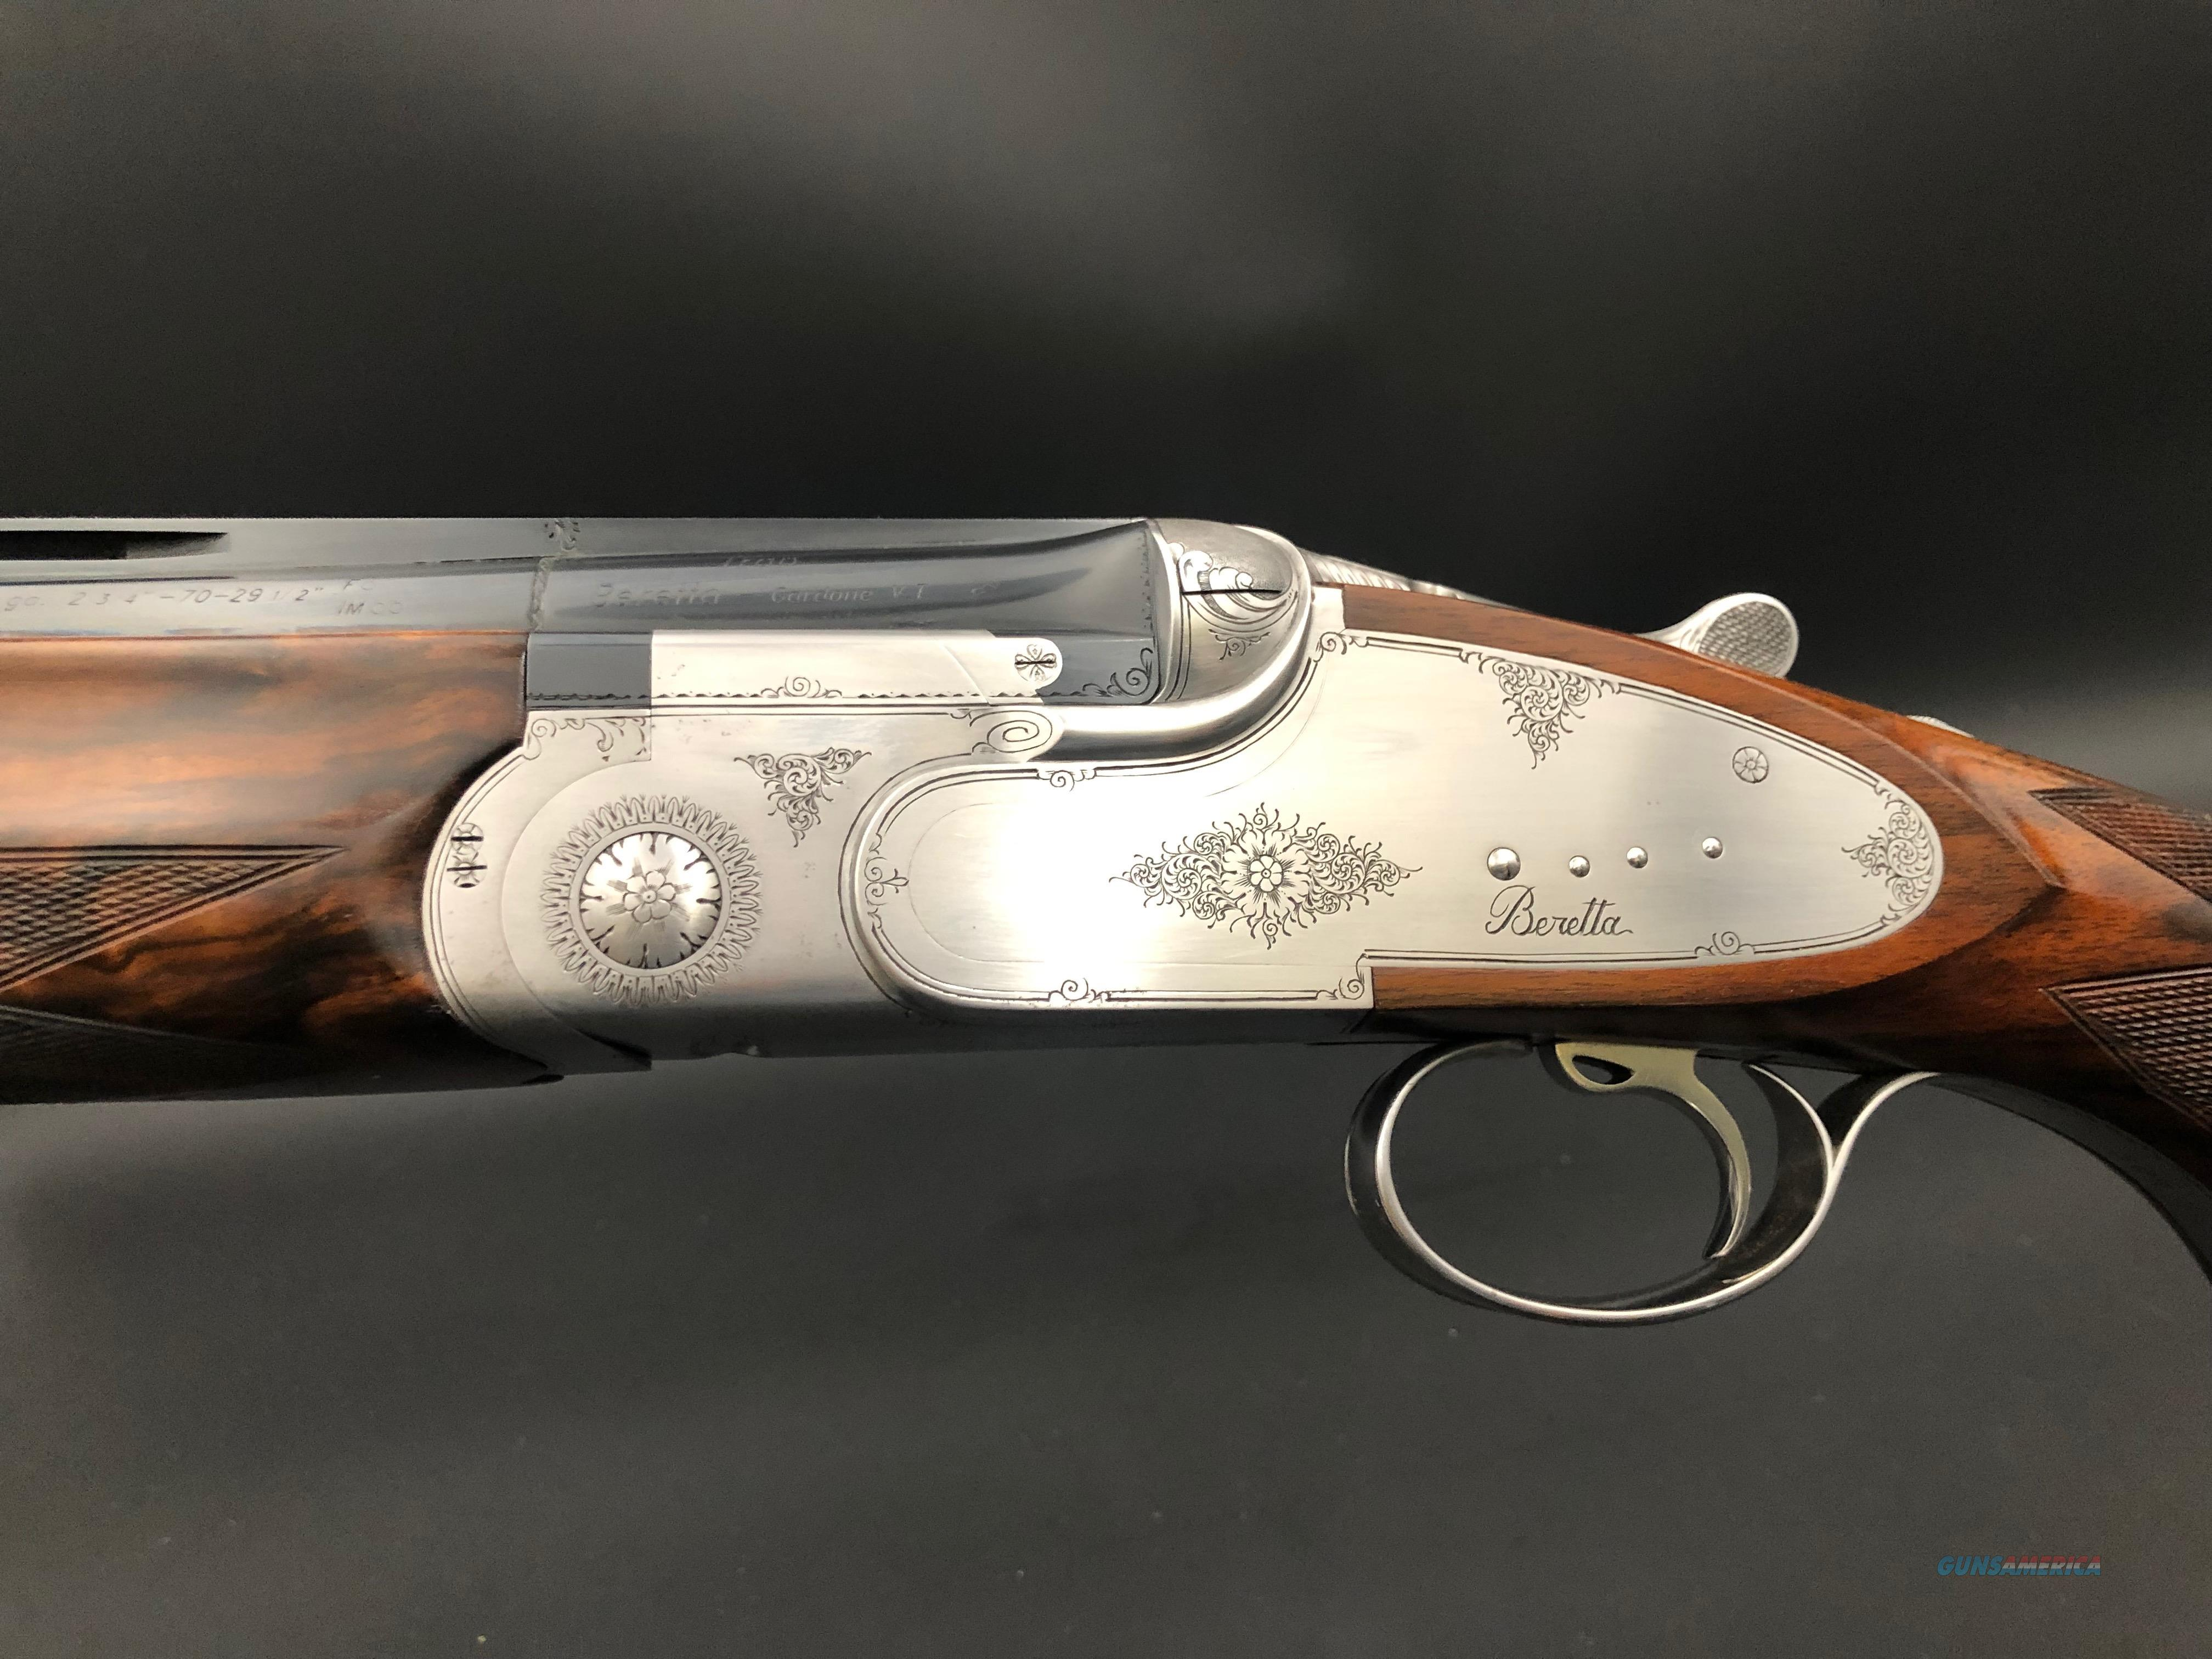 Beretta SO5 Trap  Guns > Shotguns > Beretta Shotguns > O/U > Trap/Skeet